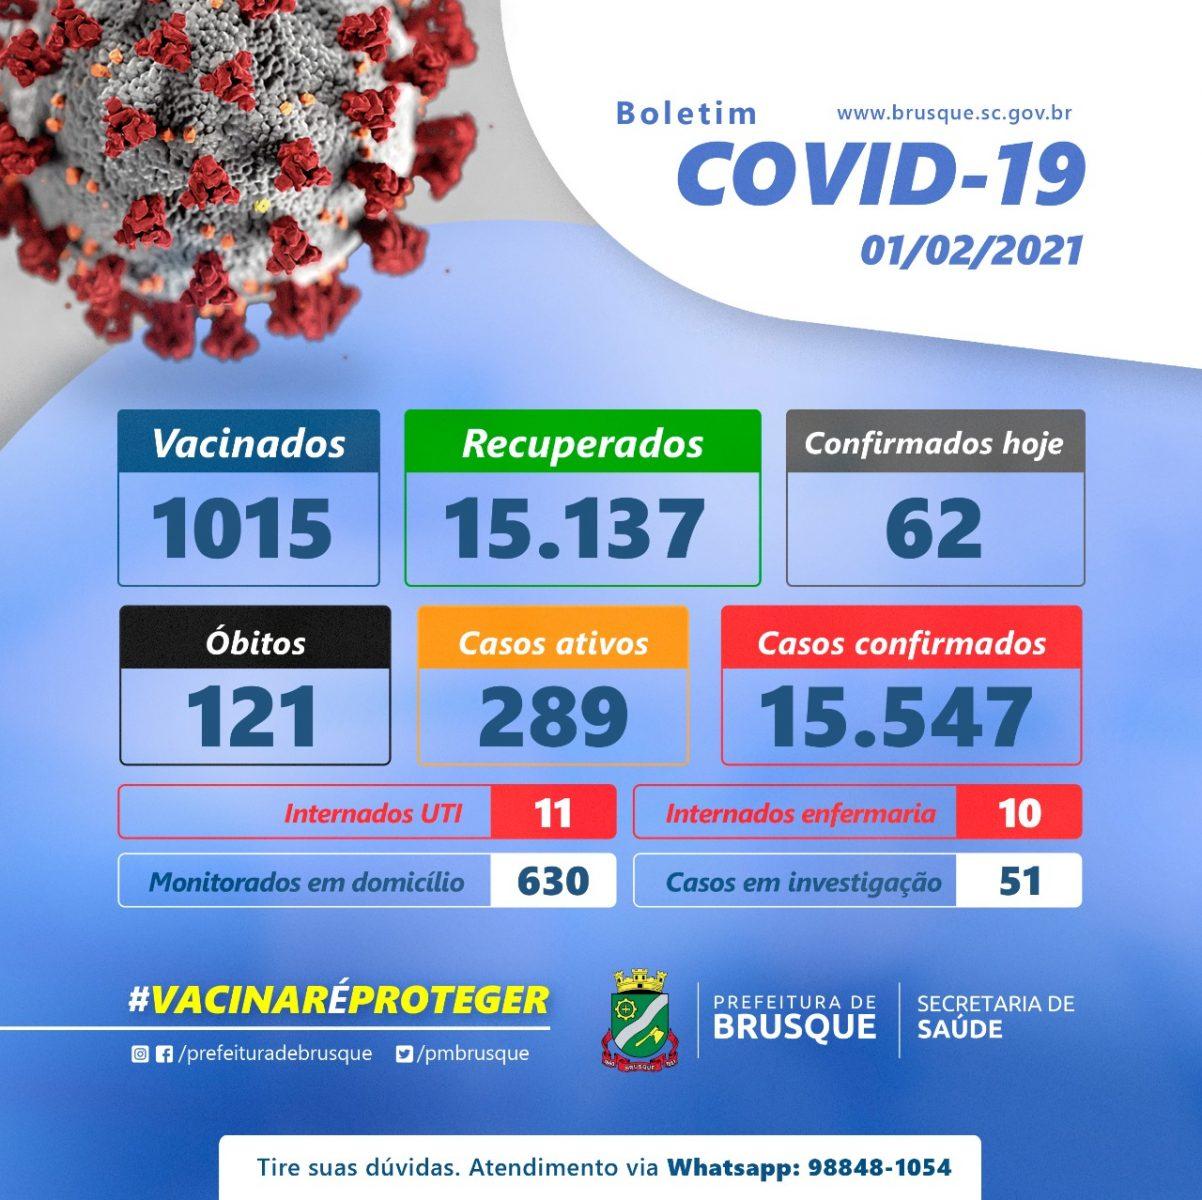 Covid-19: Confira o boletim epidemiológico desta segunda-feira (01)